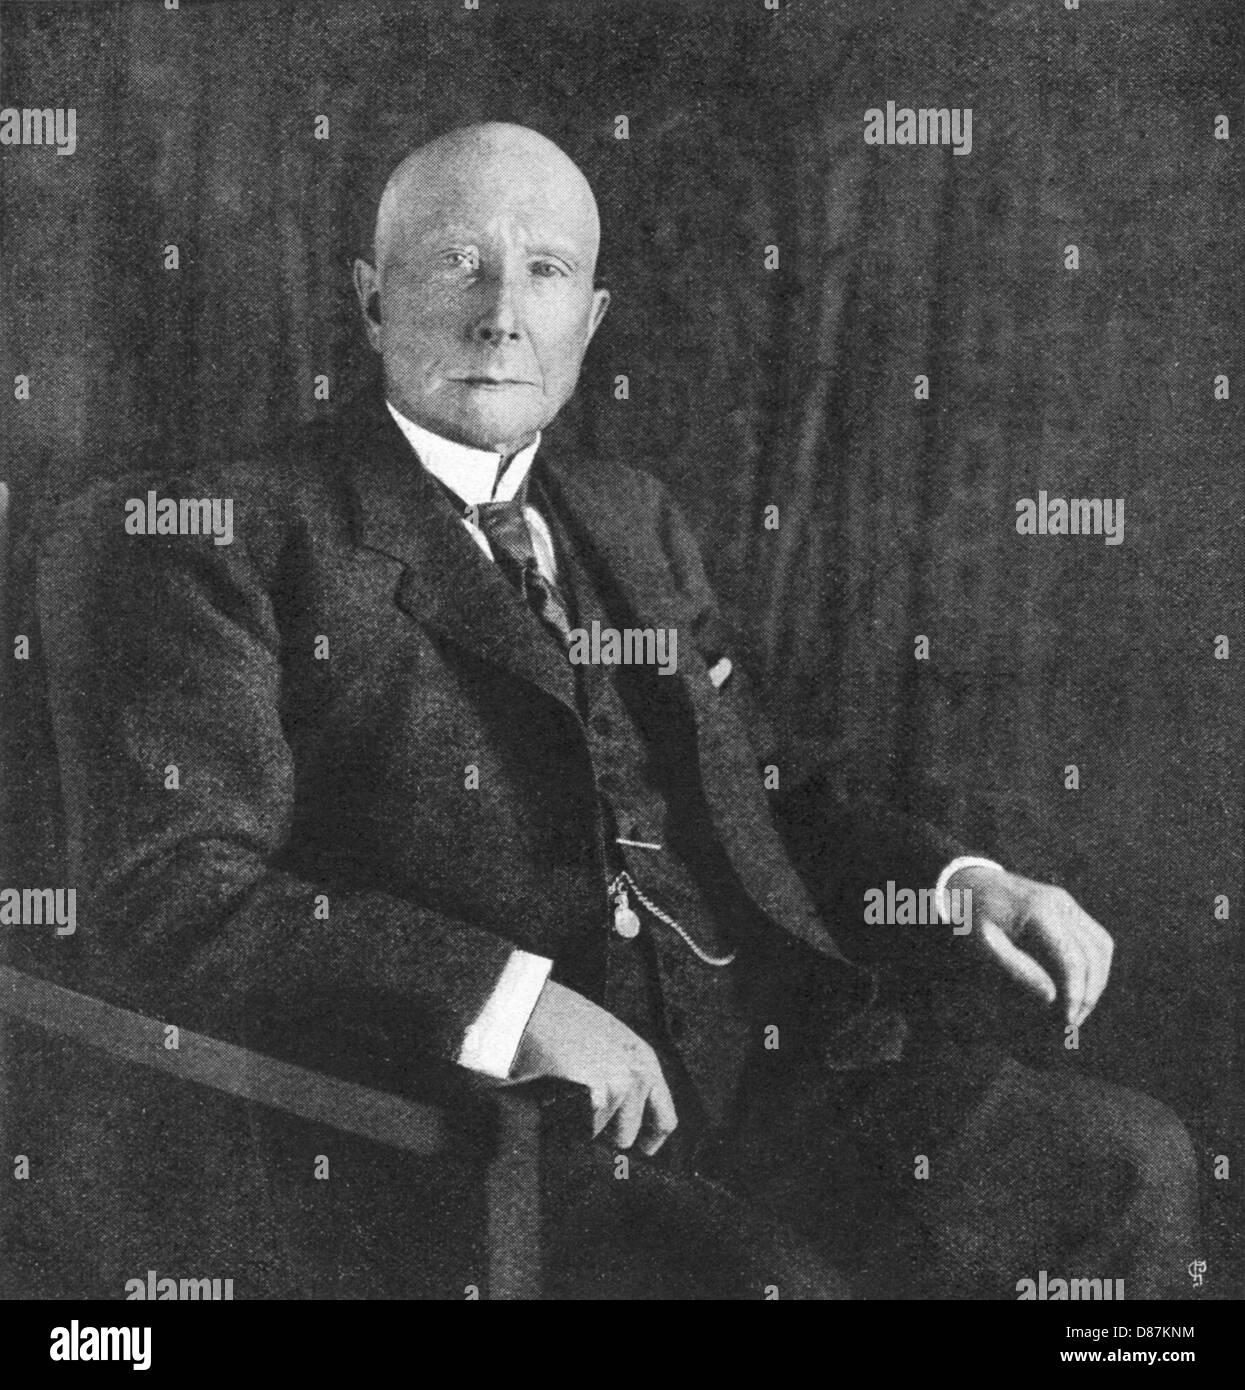 Jd Rockefeller Harmswth - Stock Image